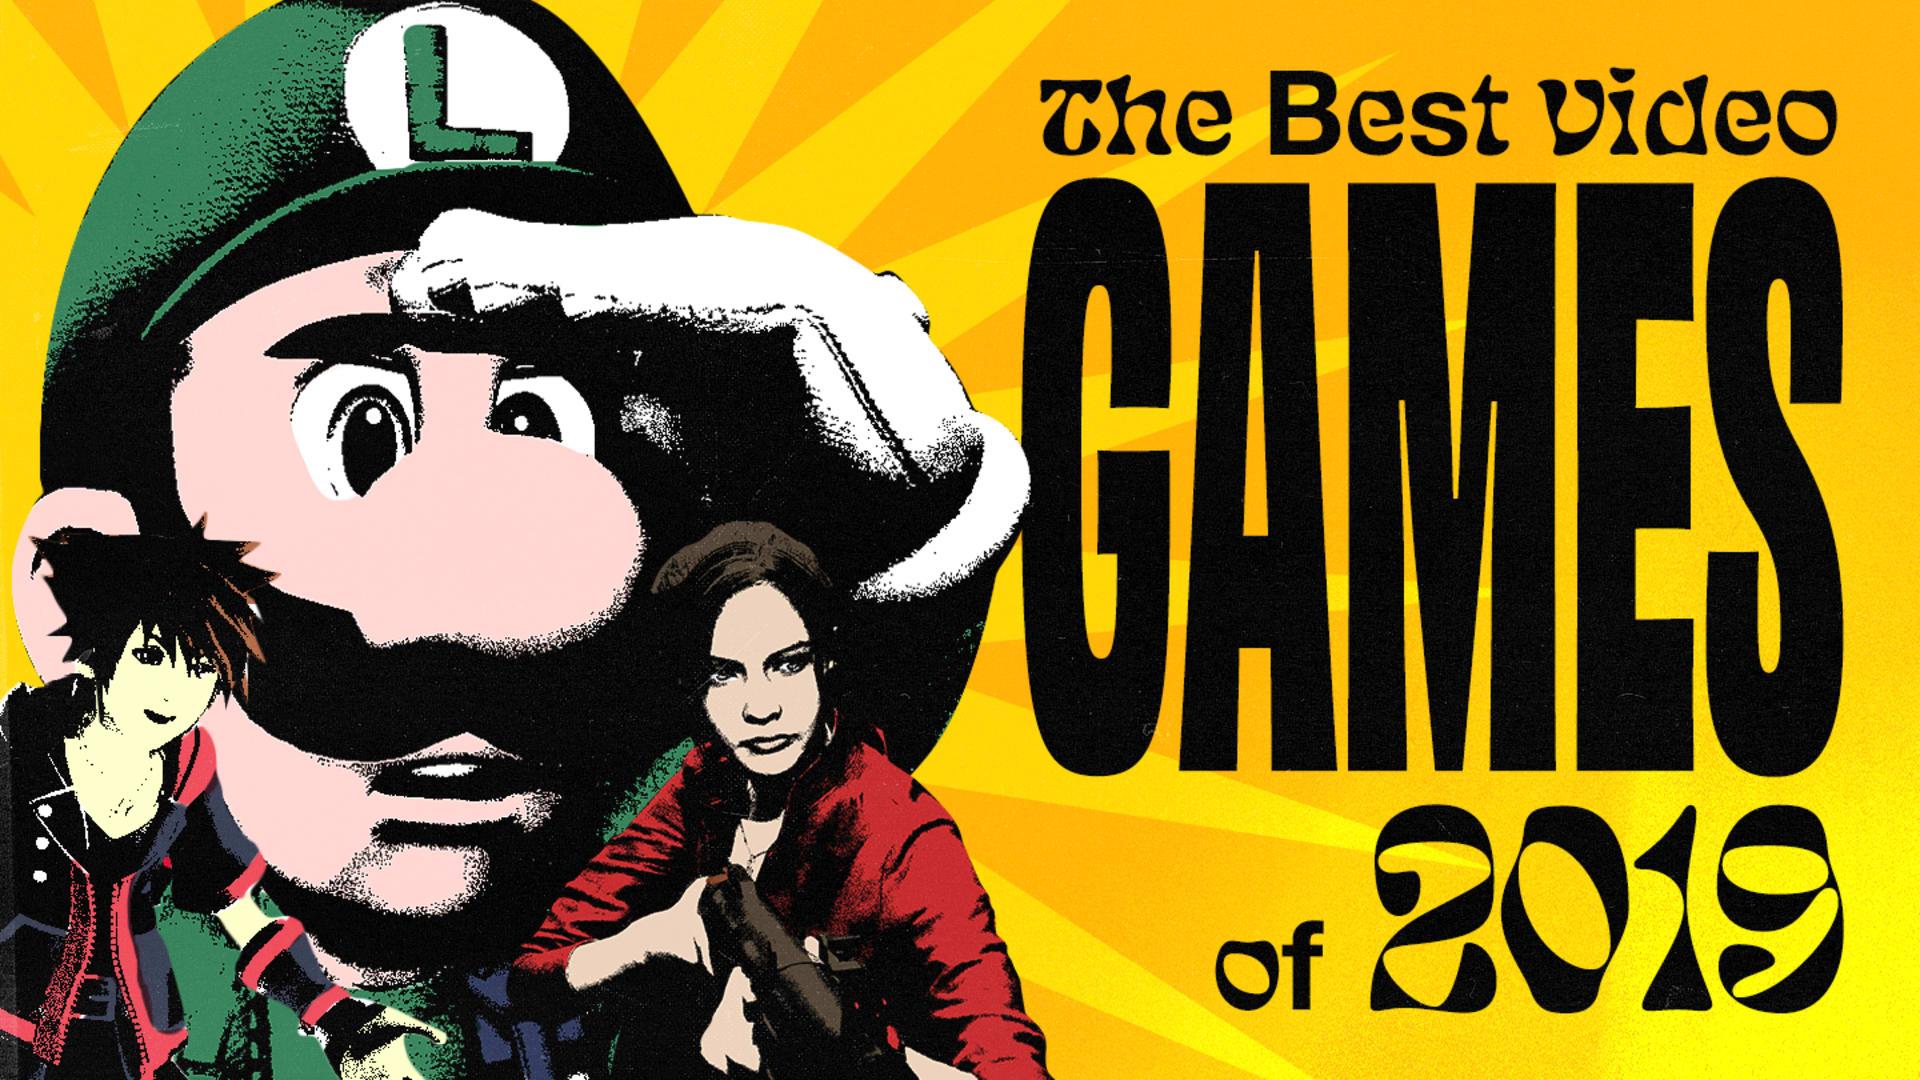 Best Video Games of 2019